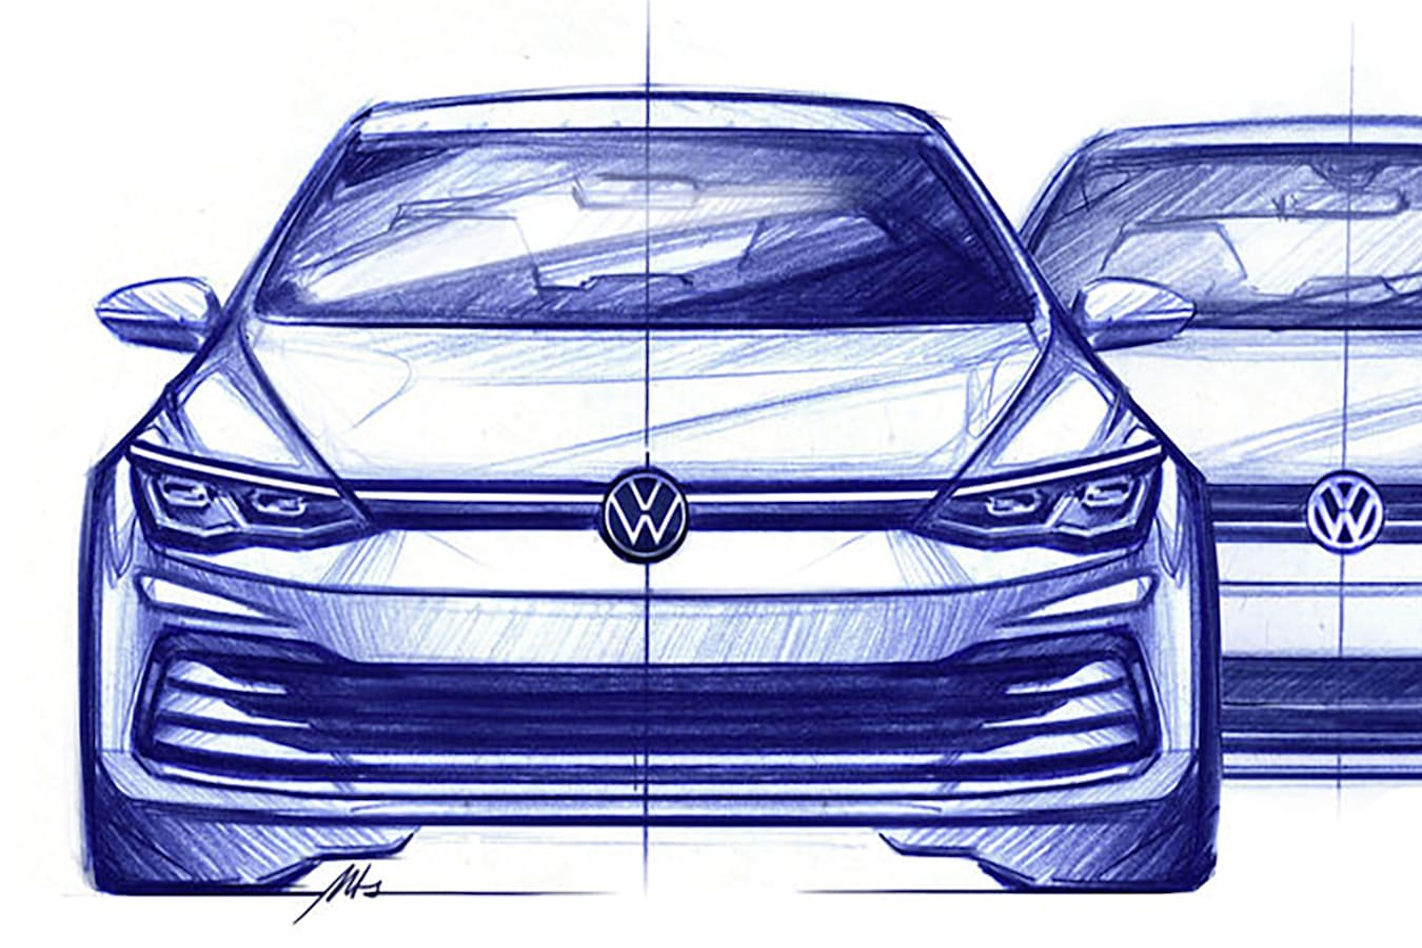 New Volkswagen Golf MK8 Sketches